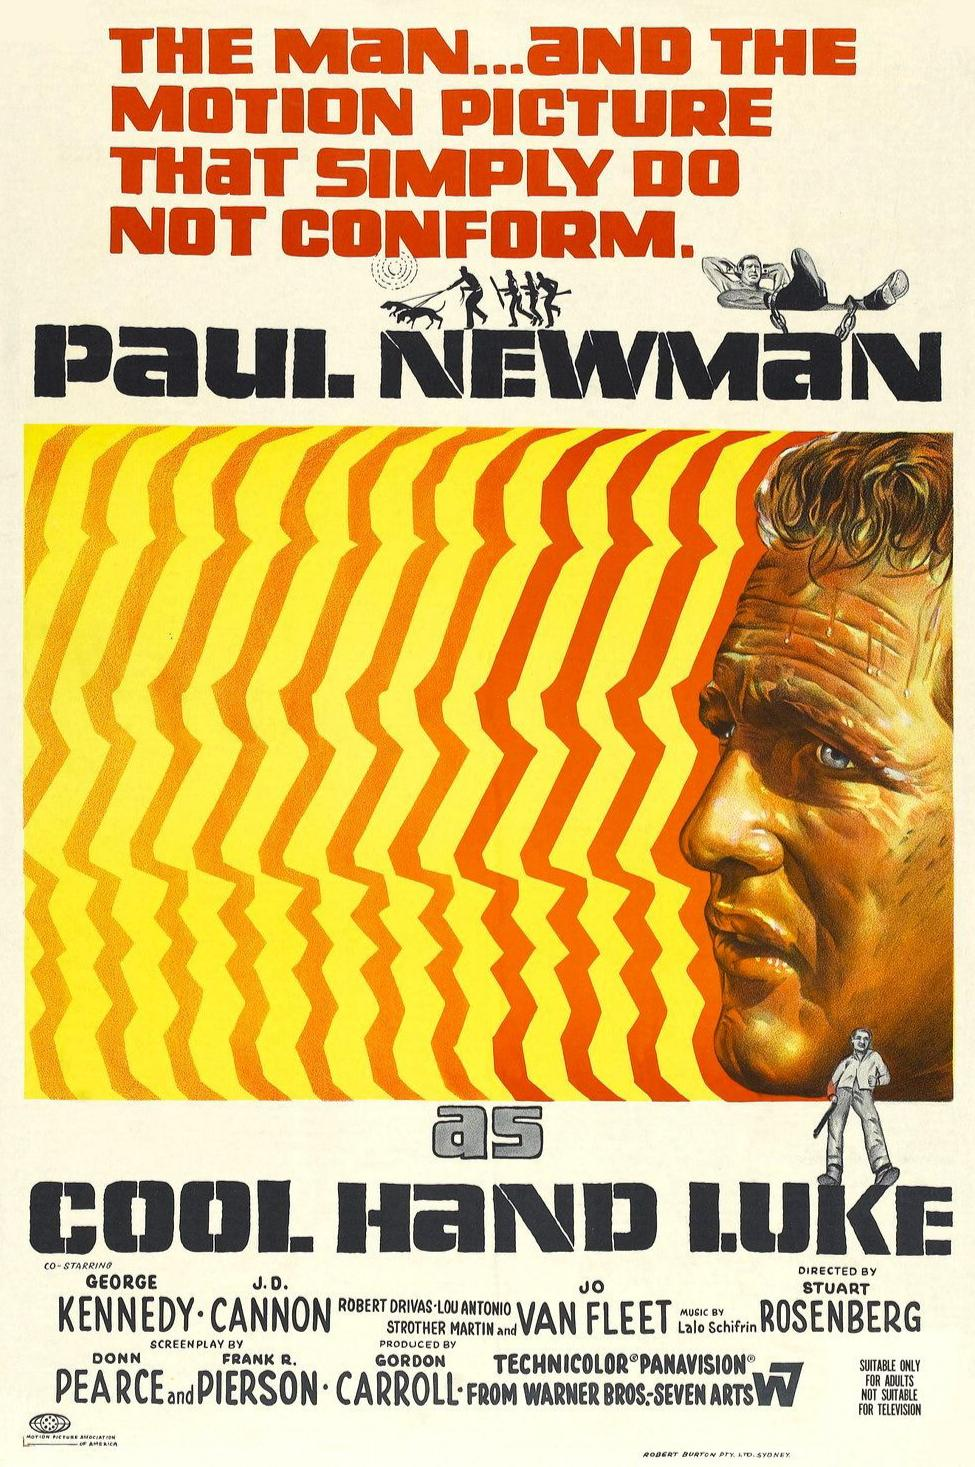 ŠALTAKRAUJIS LUKAS (1967) / COOL HAND LUKE